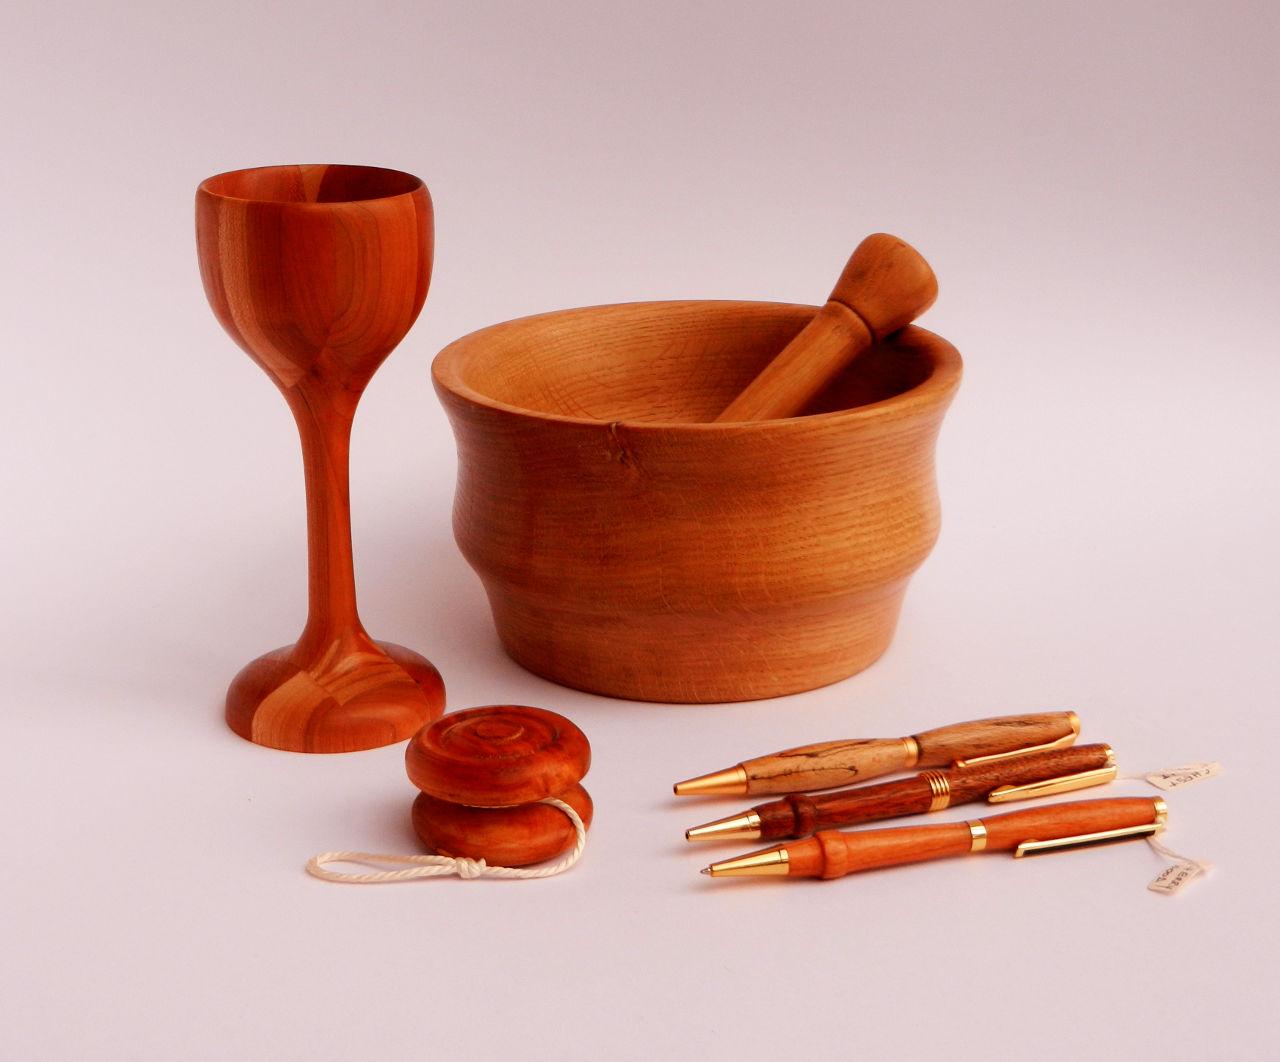 Assortment of Kilcrea Craft products